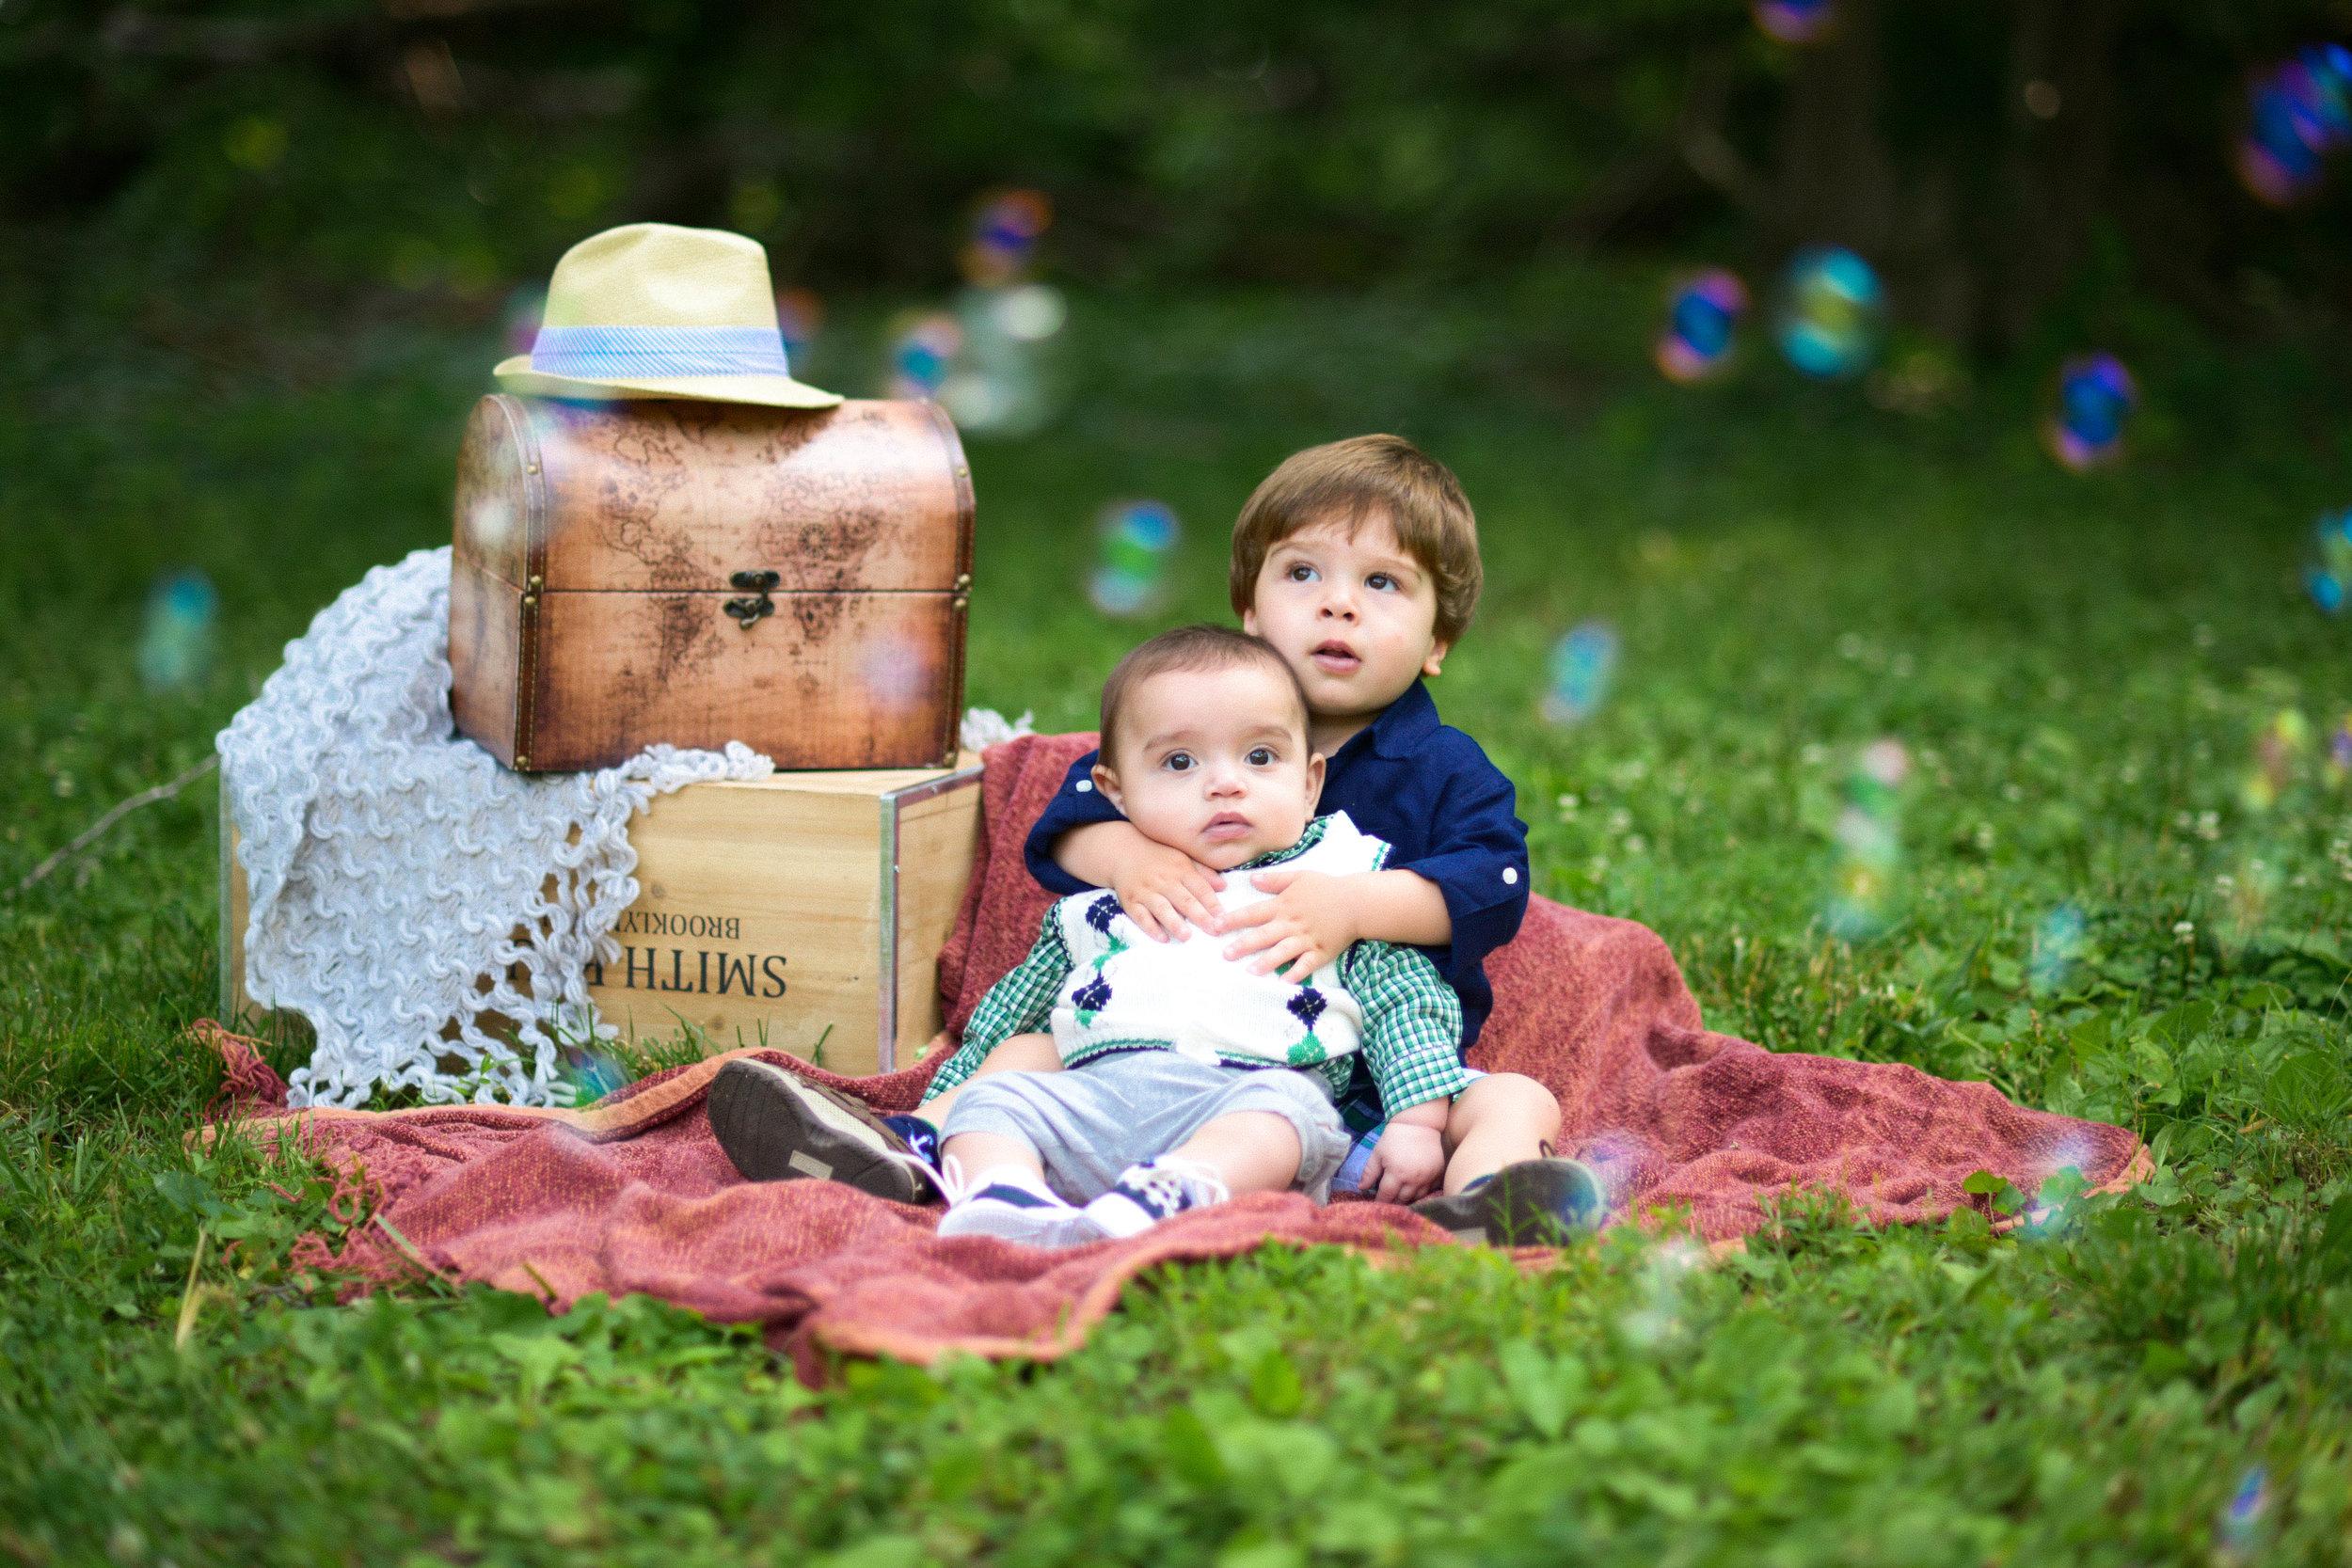 Scotts Run Preserve Kids Photos with Bubbles McLean VA